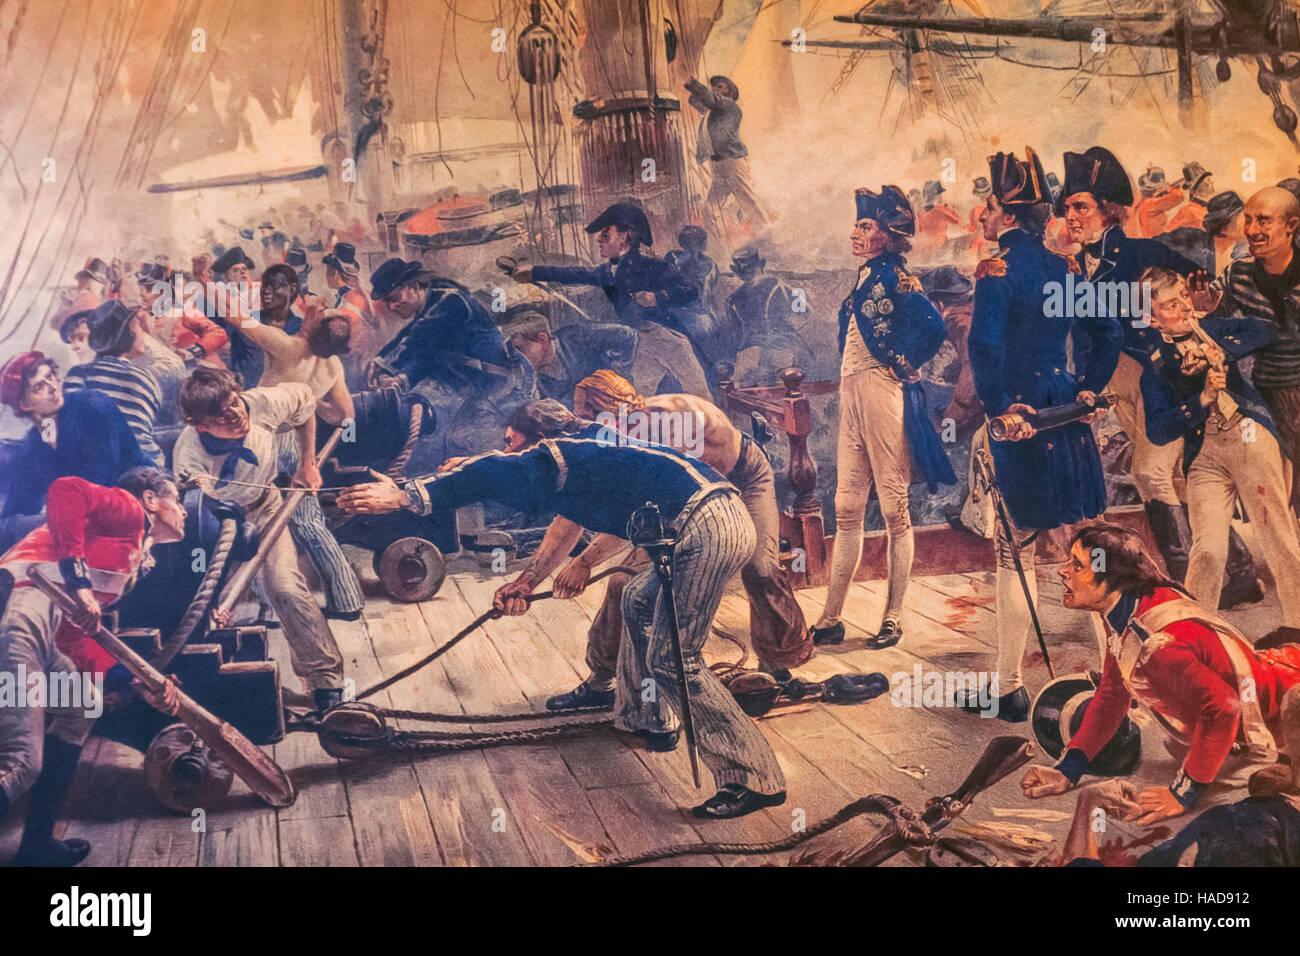 England, Hampshire, Portsmouth, Portsmouth Historic Dockyard, The National Museum, Royal Navy, Painting depicting - Stock Image